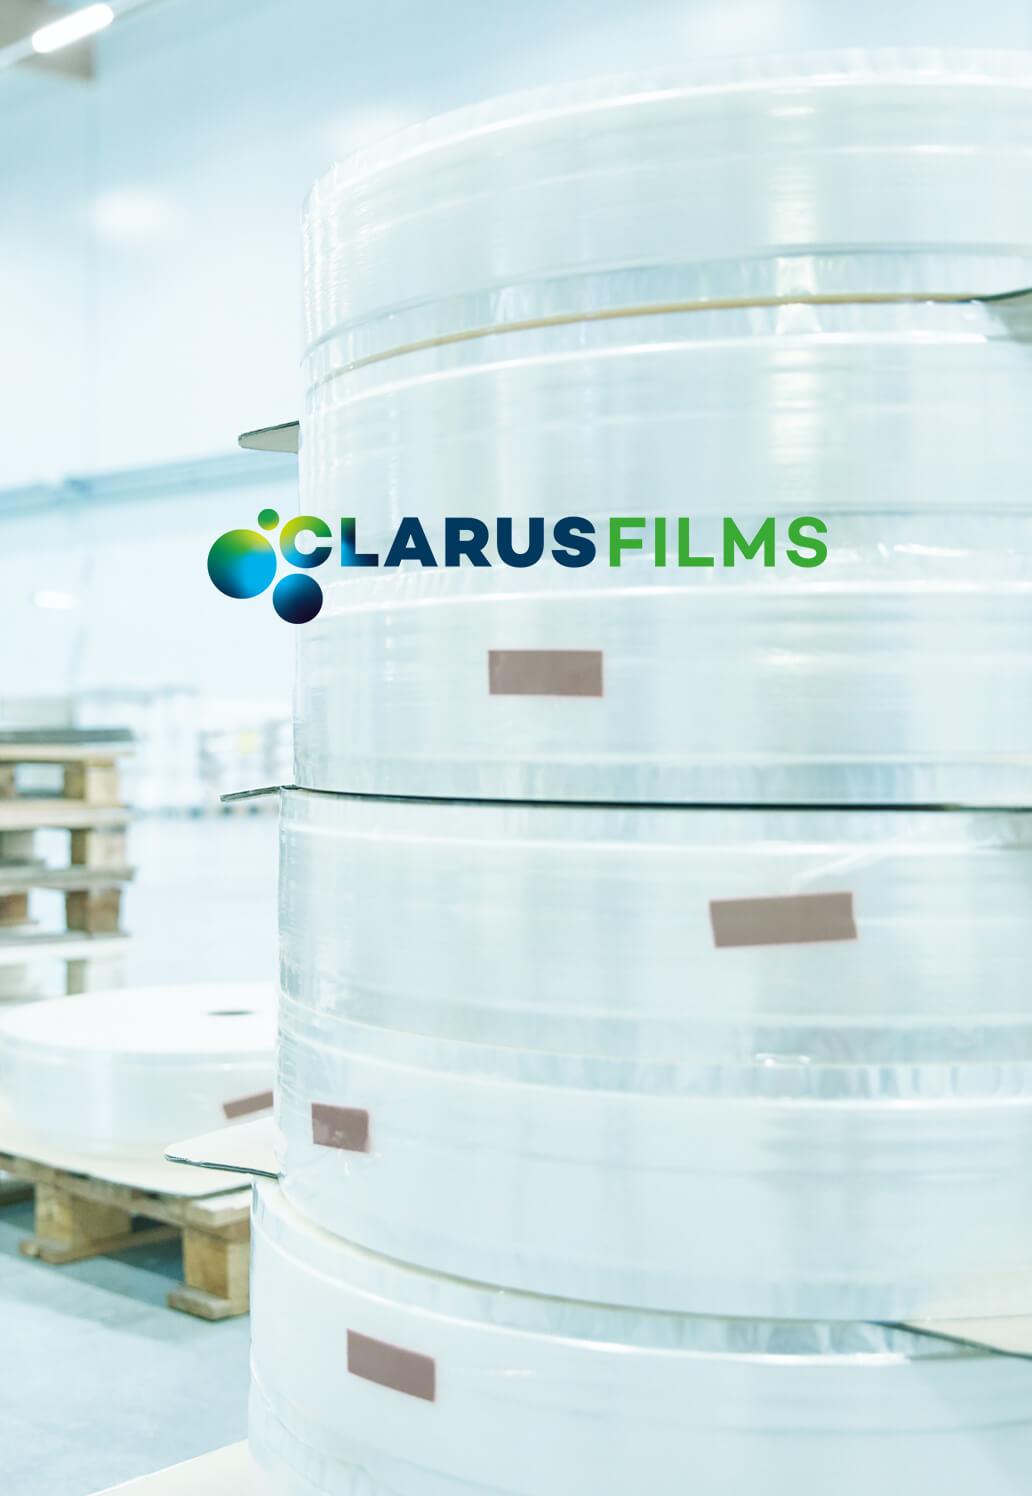 clarus-films